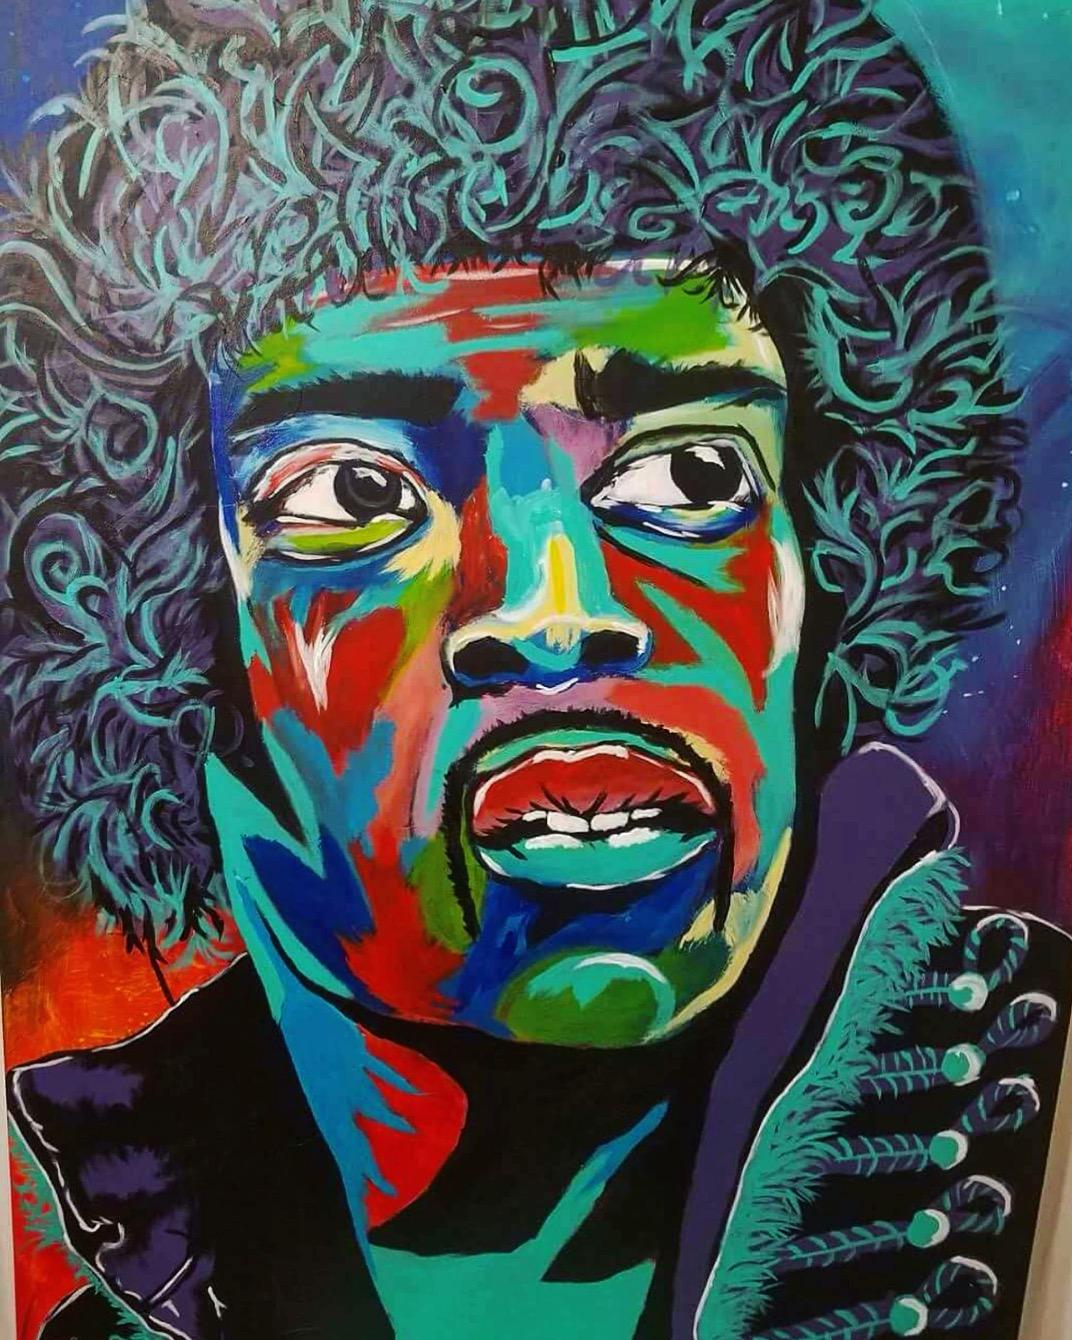 Jimi Hendrix Power Trip artwork by Brayan Caudillo - art listed for sale on Artplode